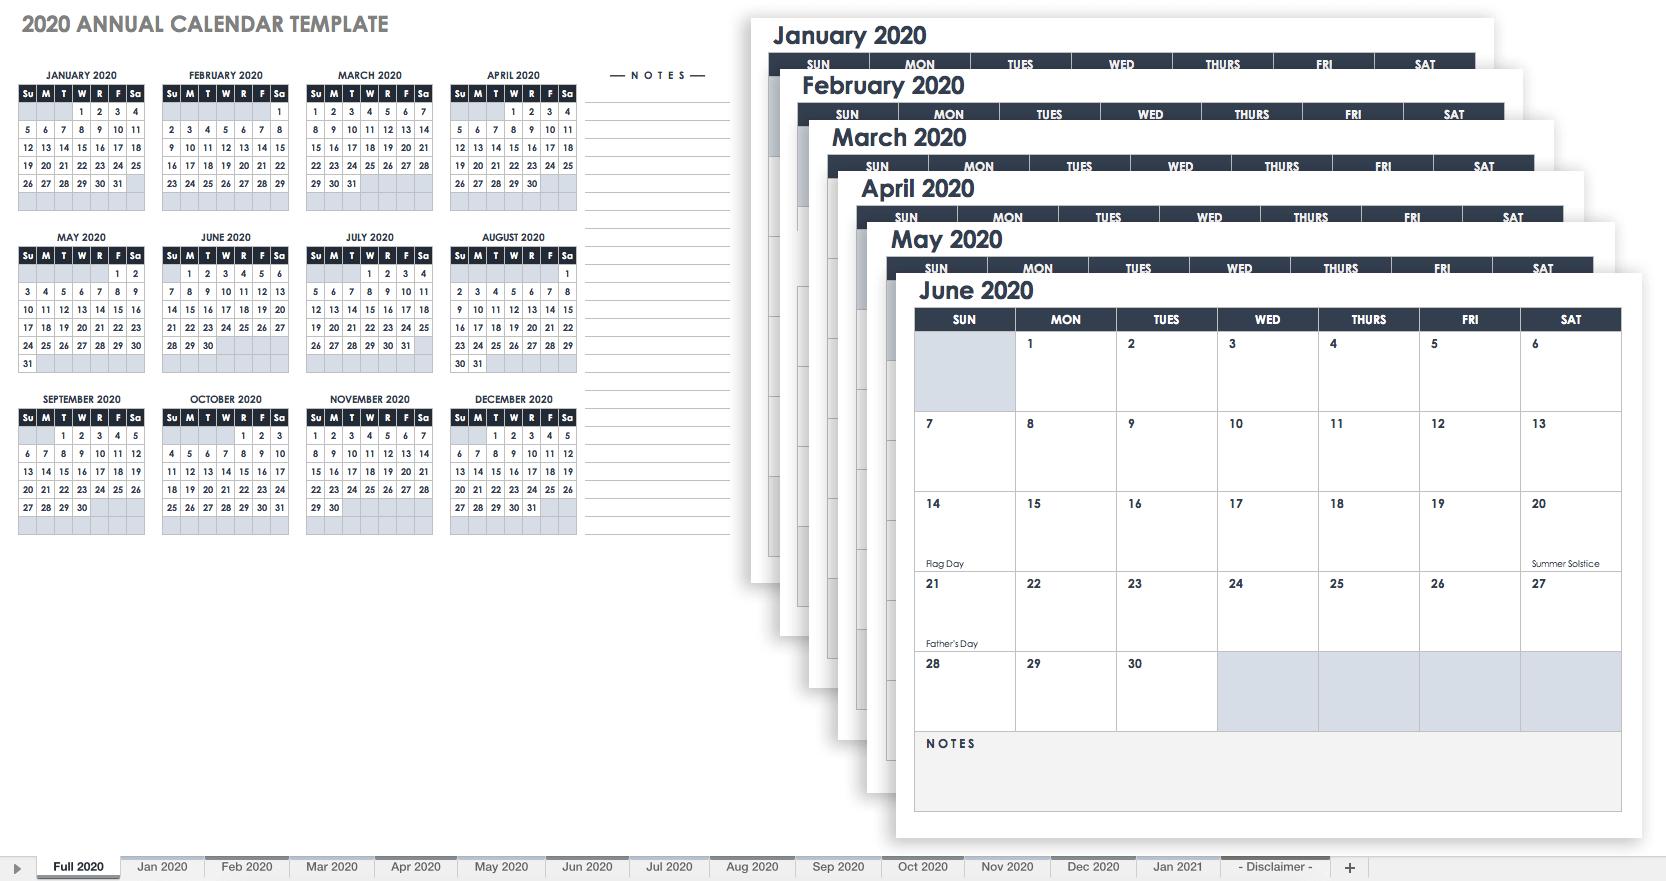 Free, Printable Excel Calendar Templates For 2019 & On | Smartsheet throughout Blank 6 Month Calendar